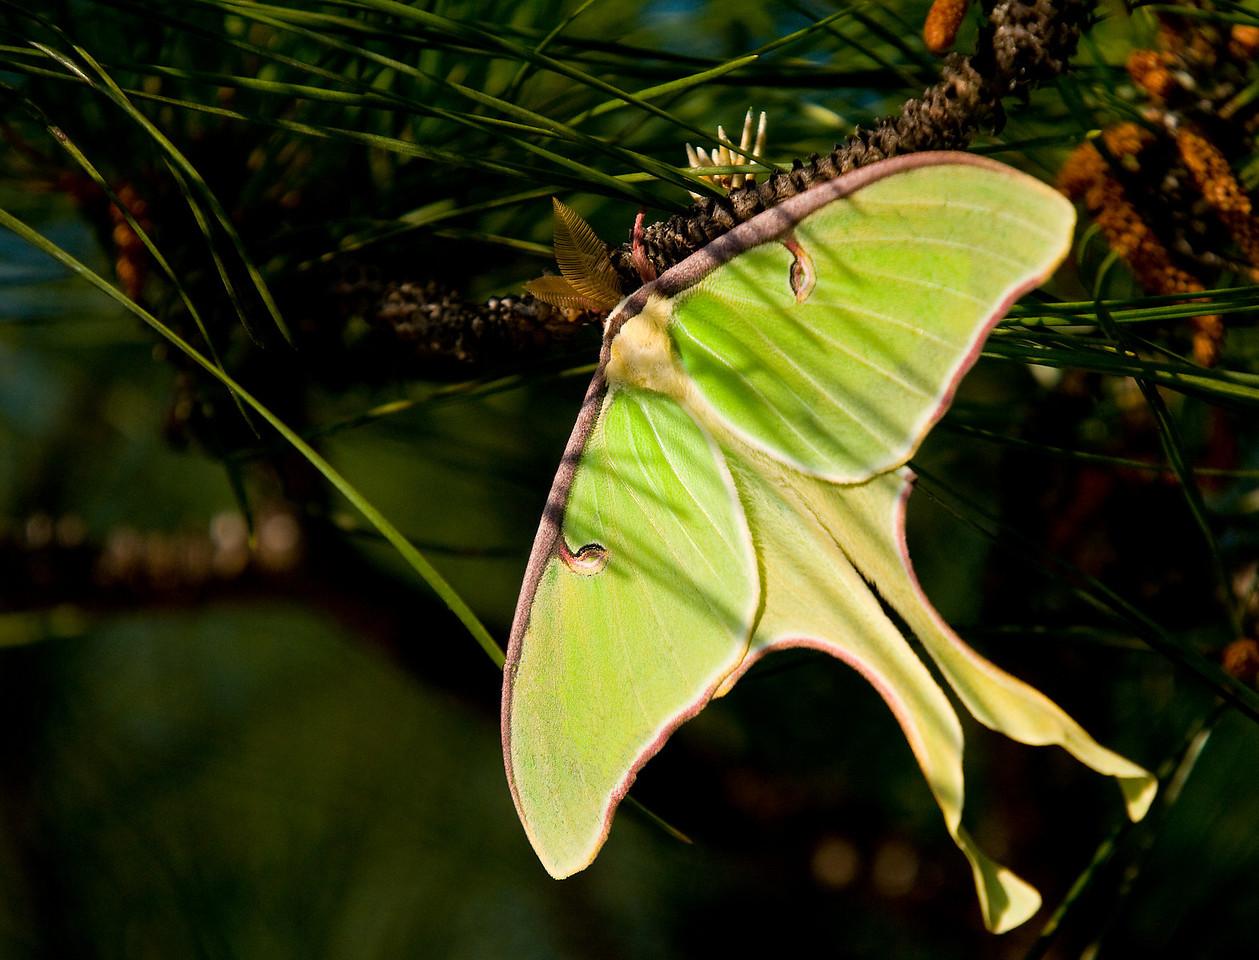 Luna moth on a pine branch